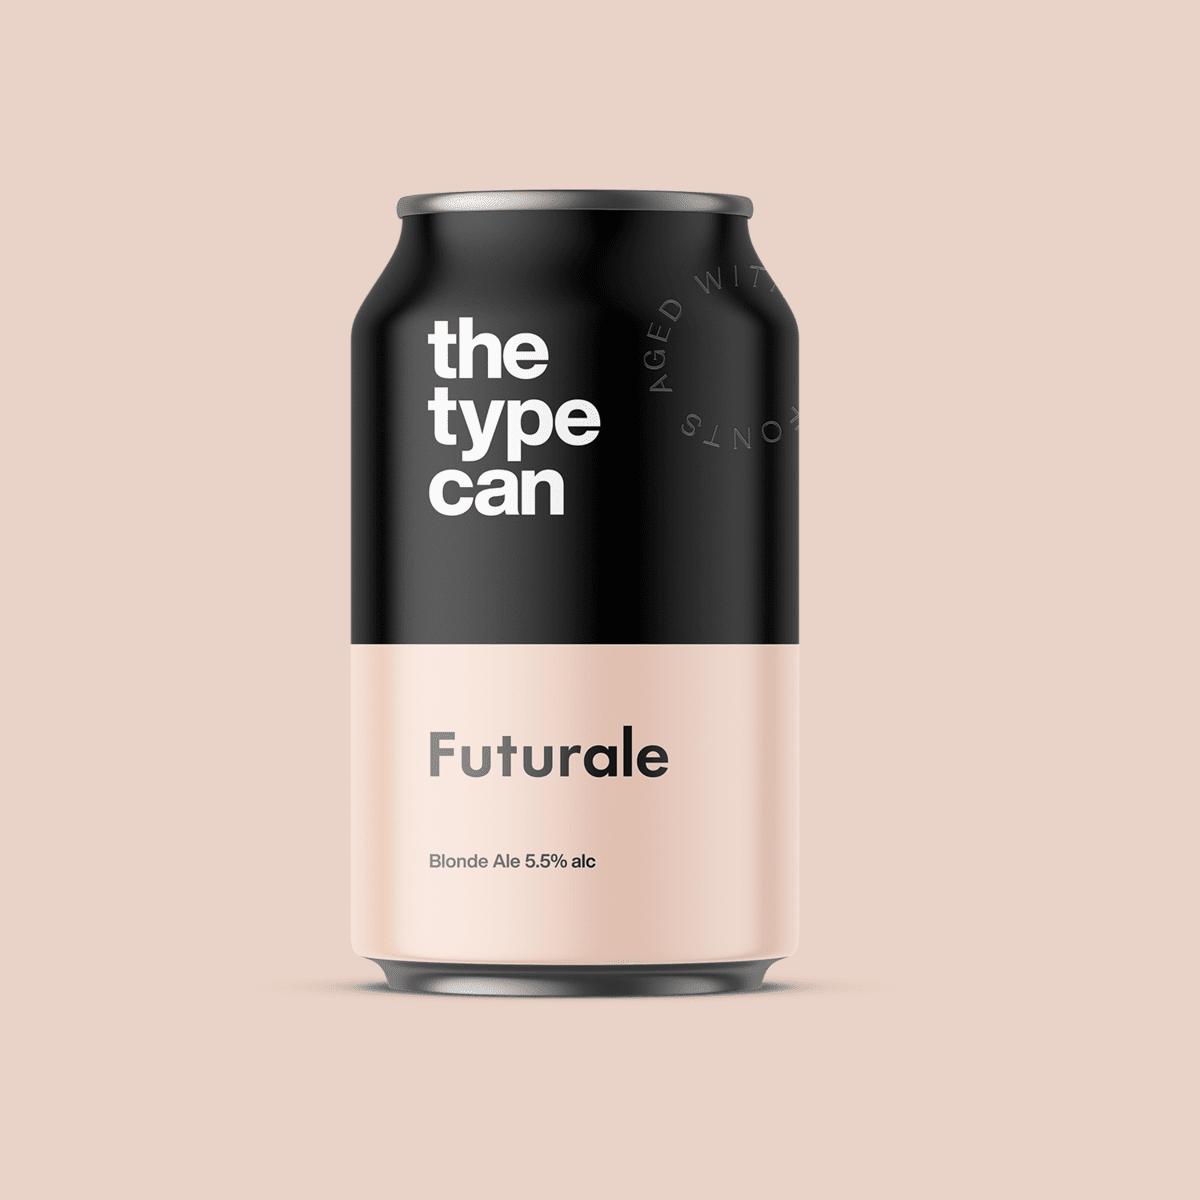 Thetypecan 3 - Obal piva pro milovníky typografie